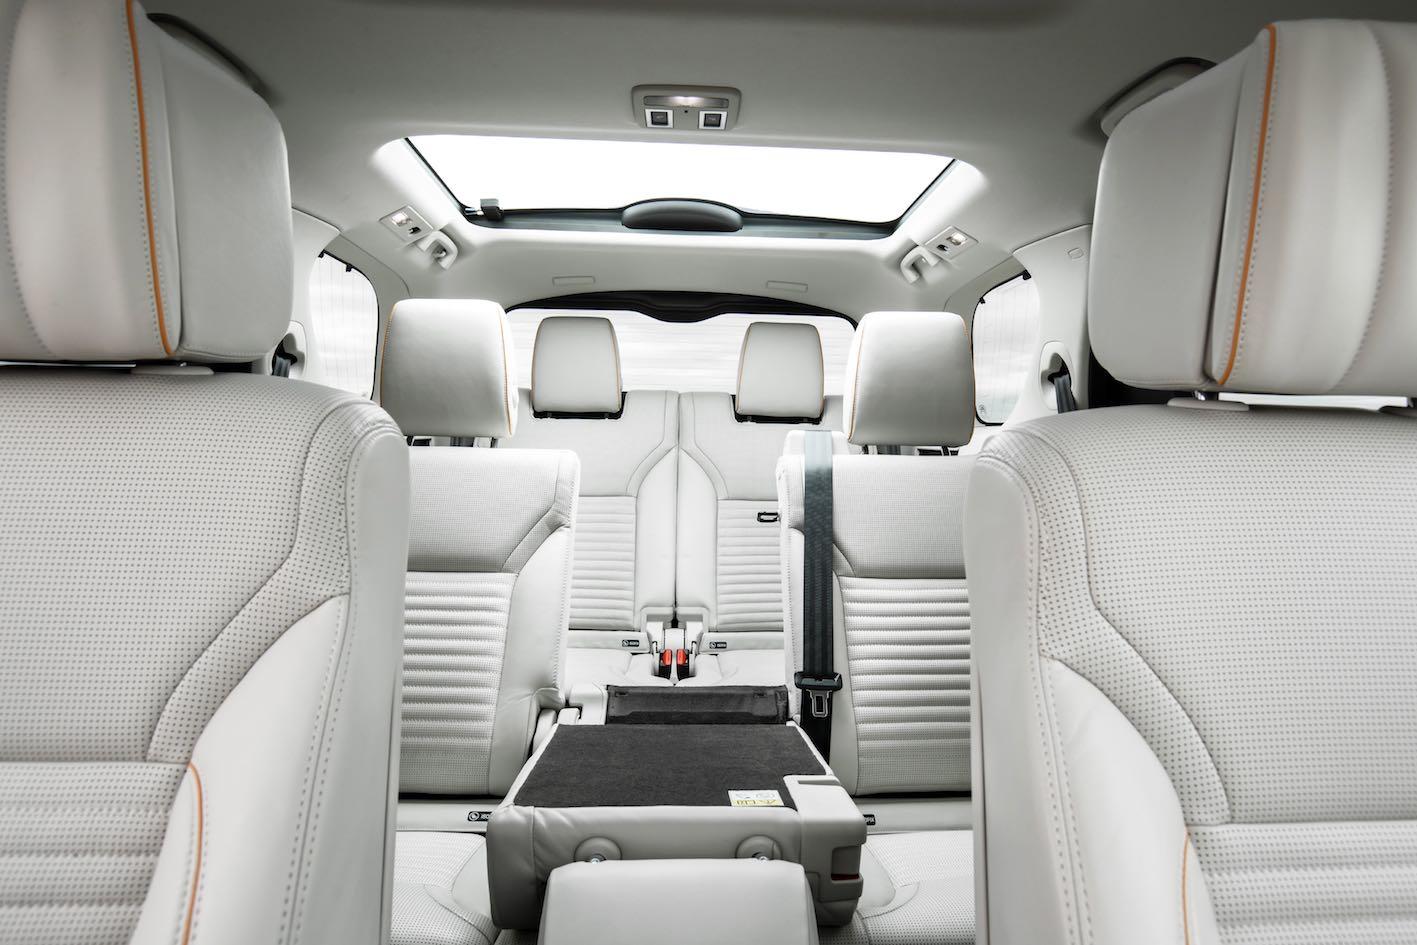 Land Rover Discovery 2019 Innenausstattung